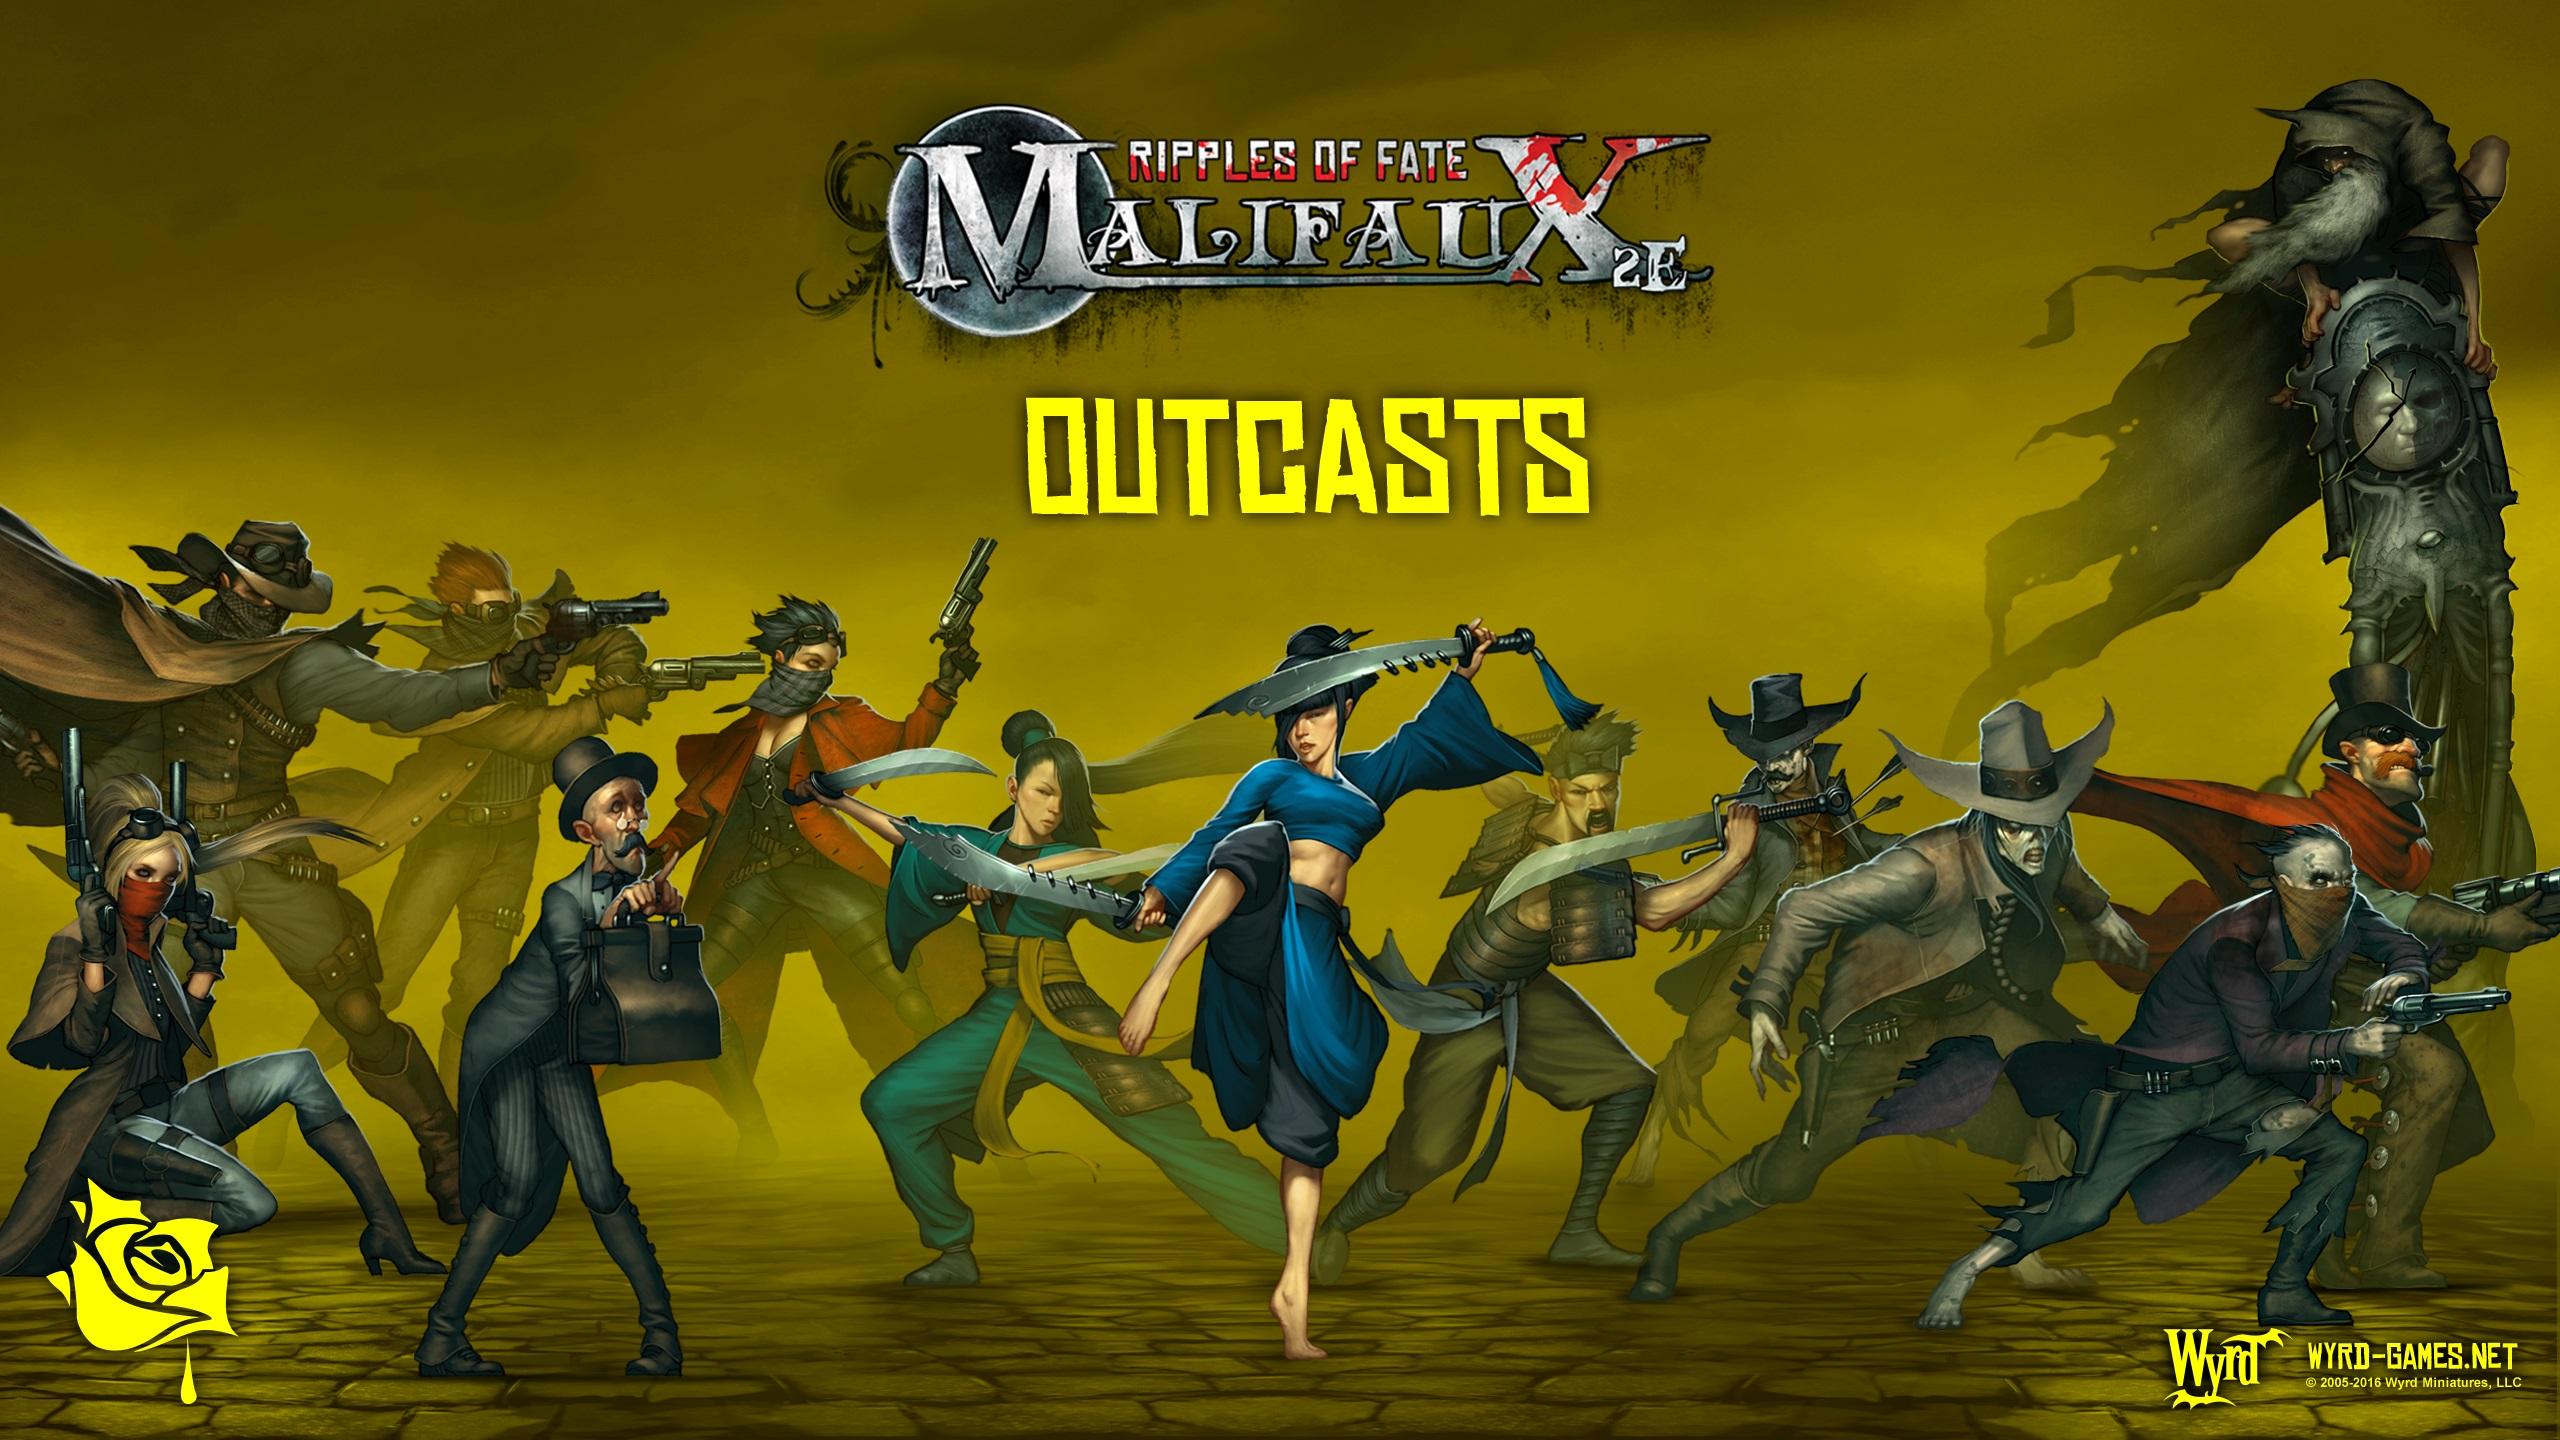 Outcasts Malifaux